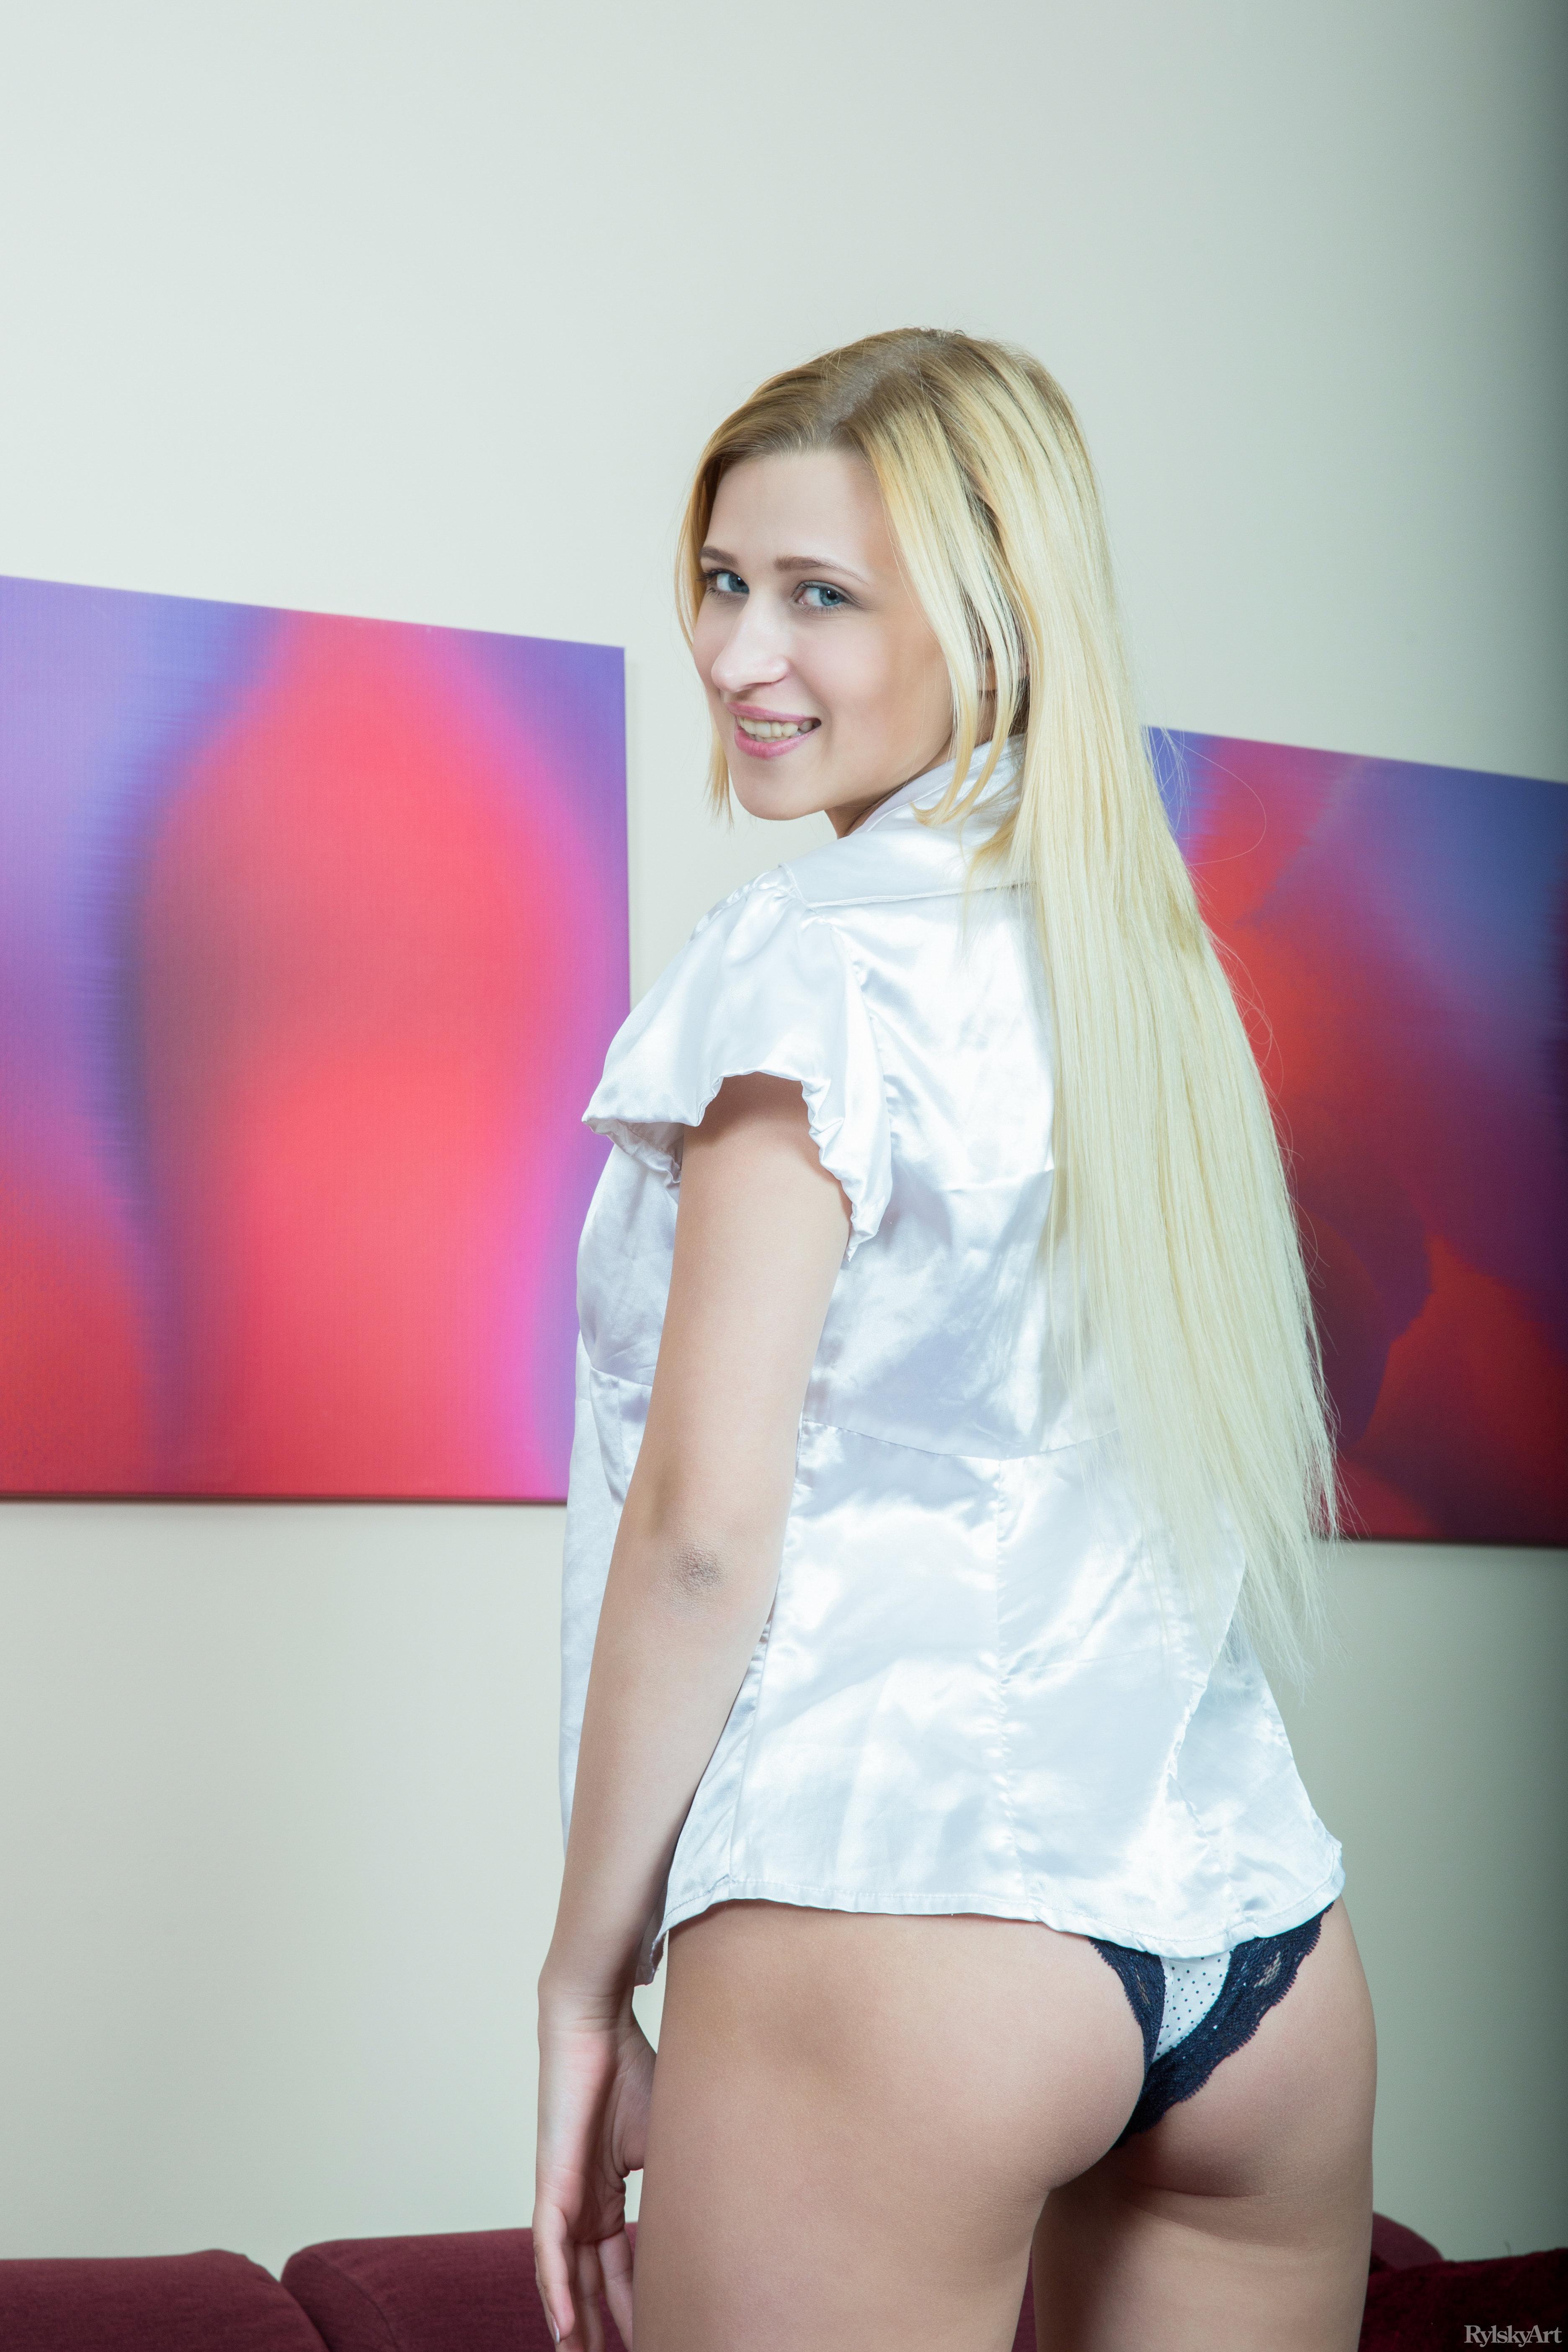 People 3744x5616 blonde women couch RylskyArt Magazine Lisa Dawn